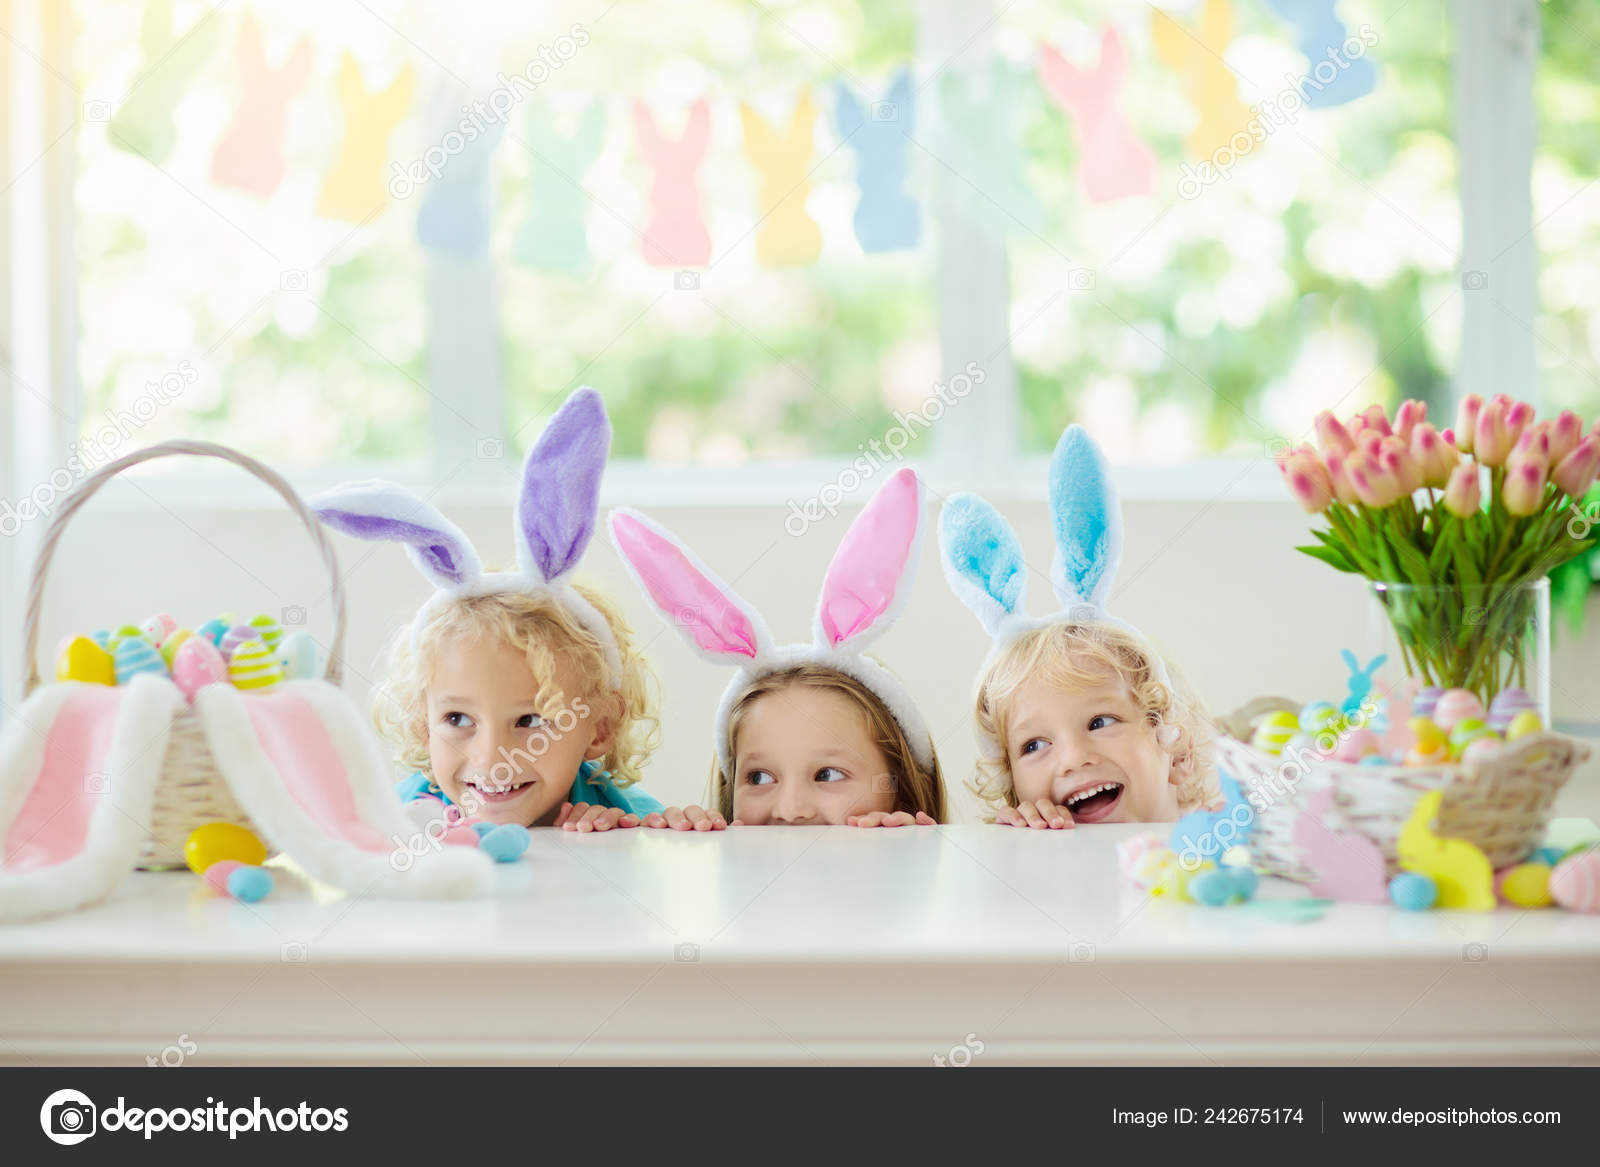 Kids Dyeing Easter Eggs Children Bunny Ears Dye Colorful Egg